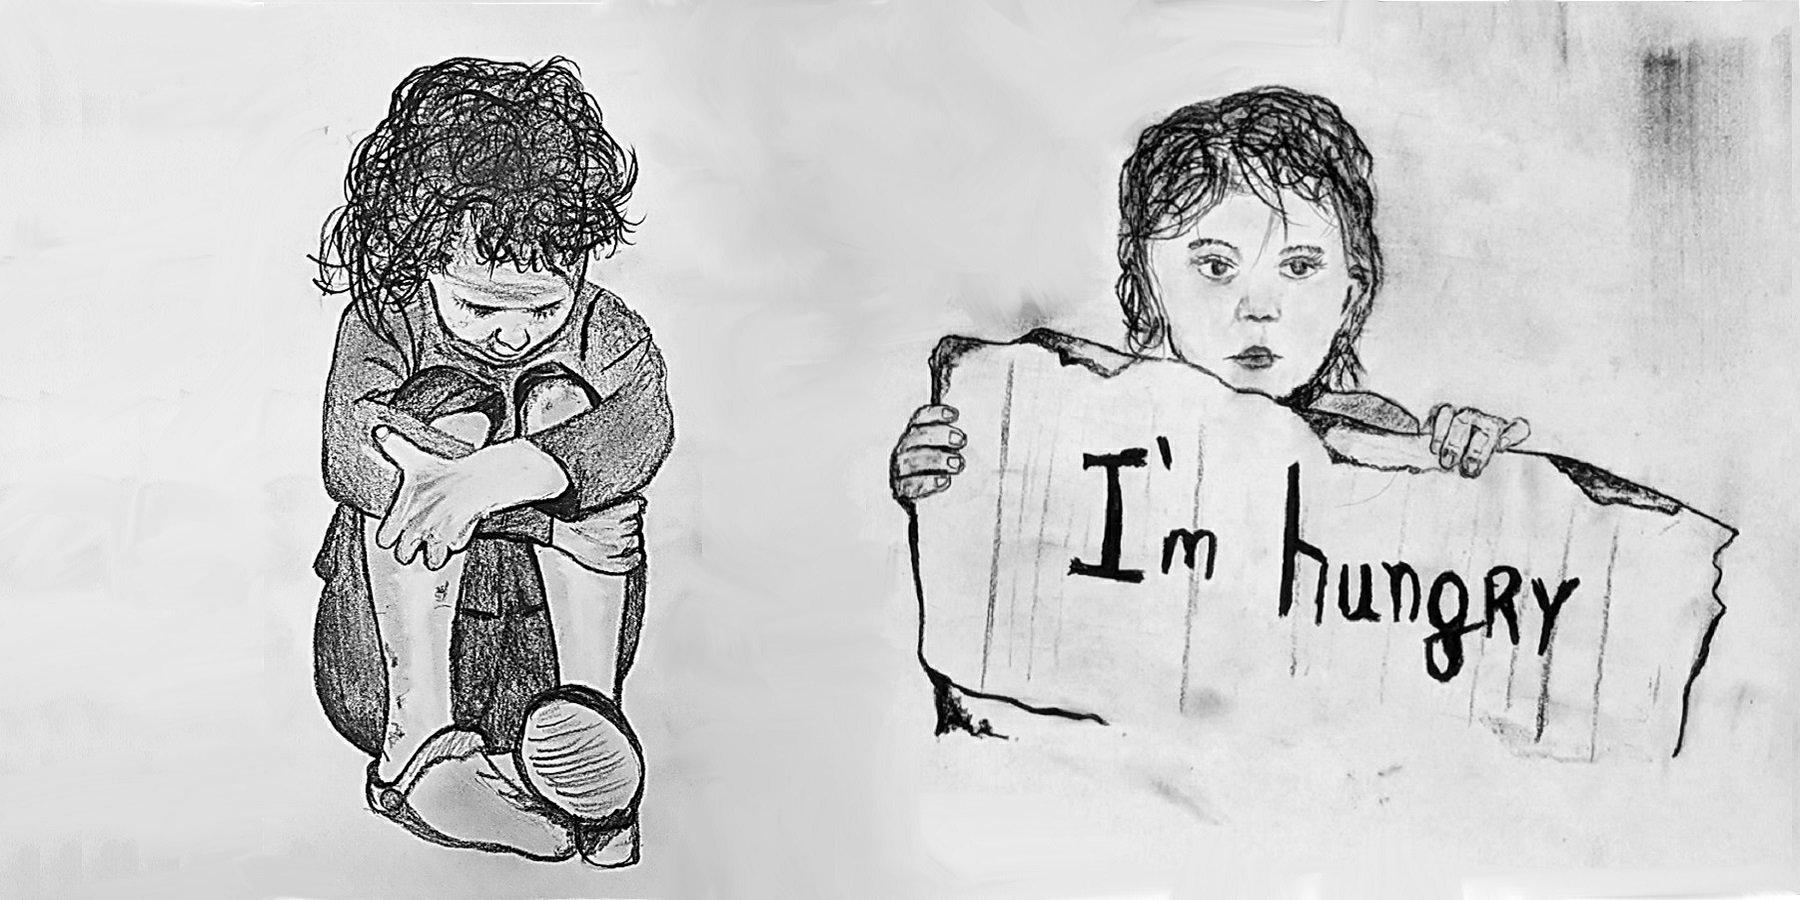 Sofia's Story: The Sad Reality Behind a Humanitarian Crisis